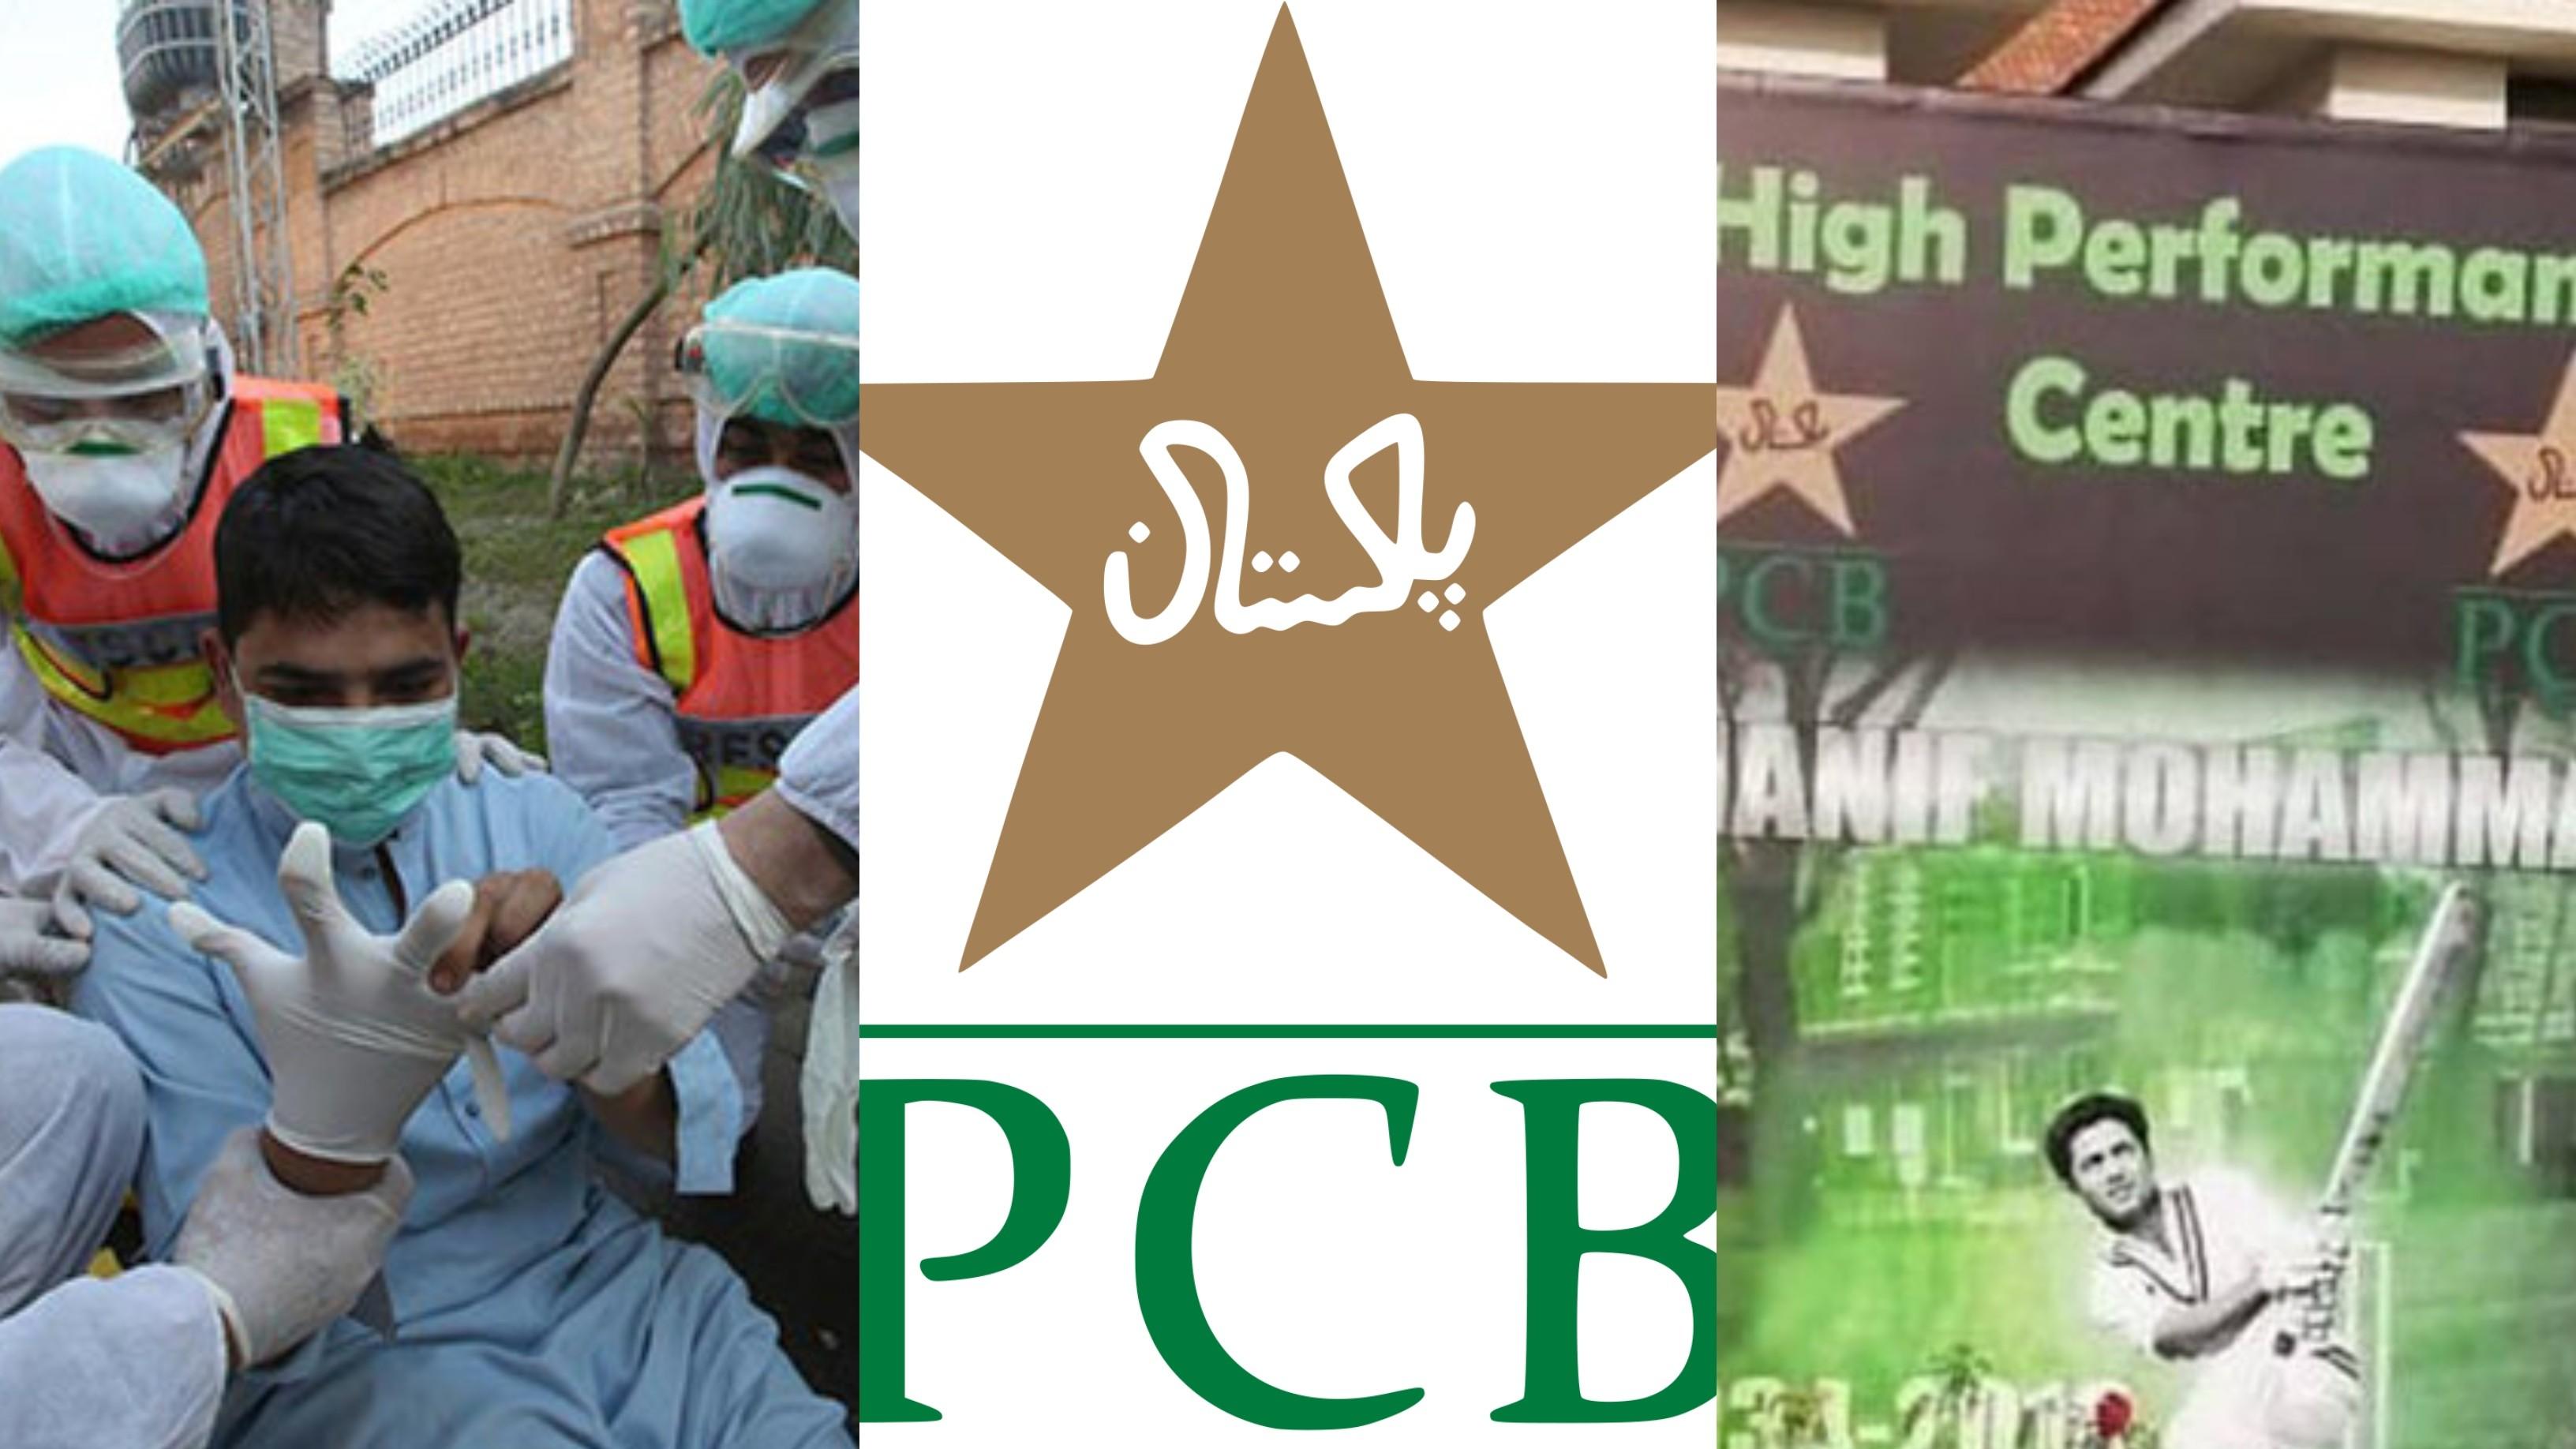 PCB converts Karachi High-Performance Centre into temporary sanctuary for paramedic staff